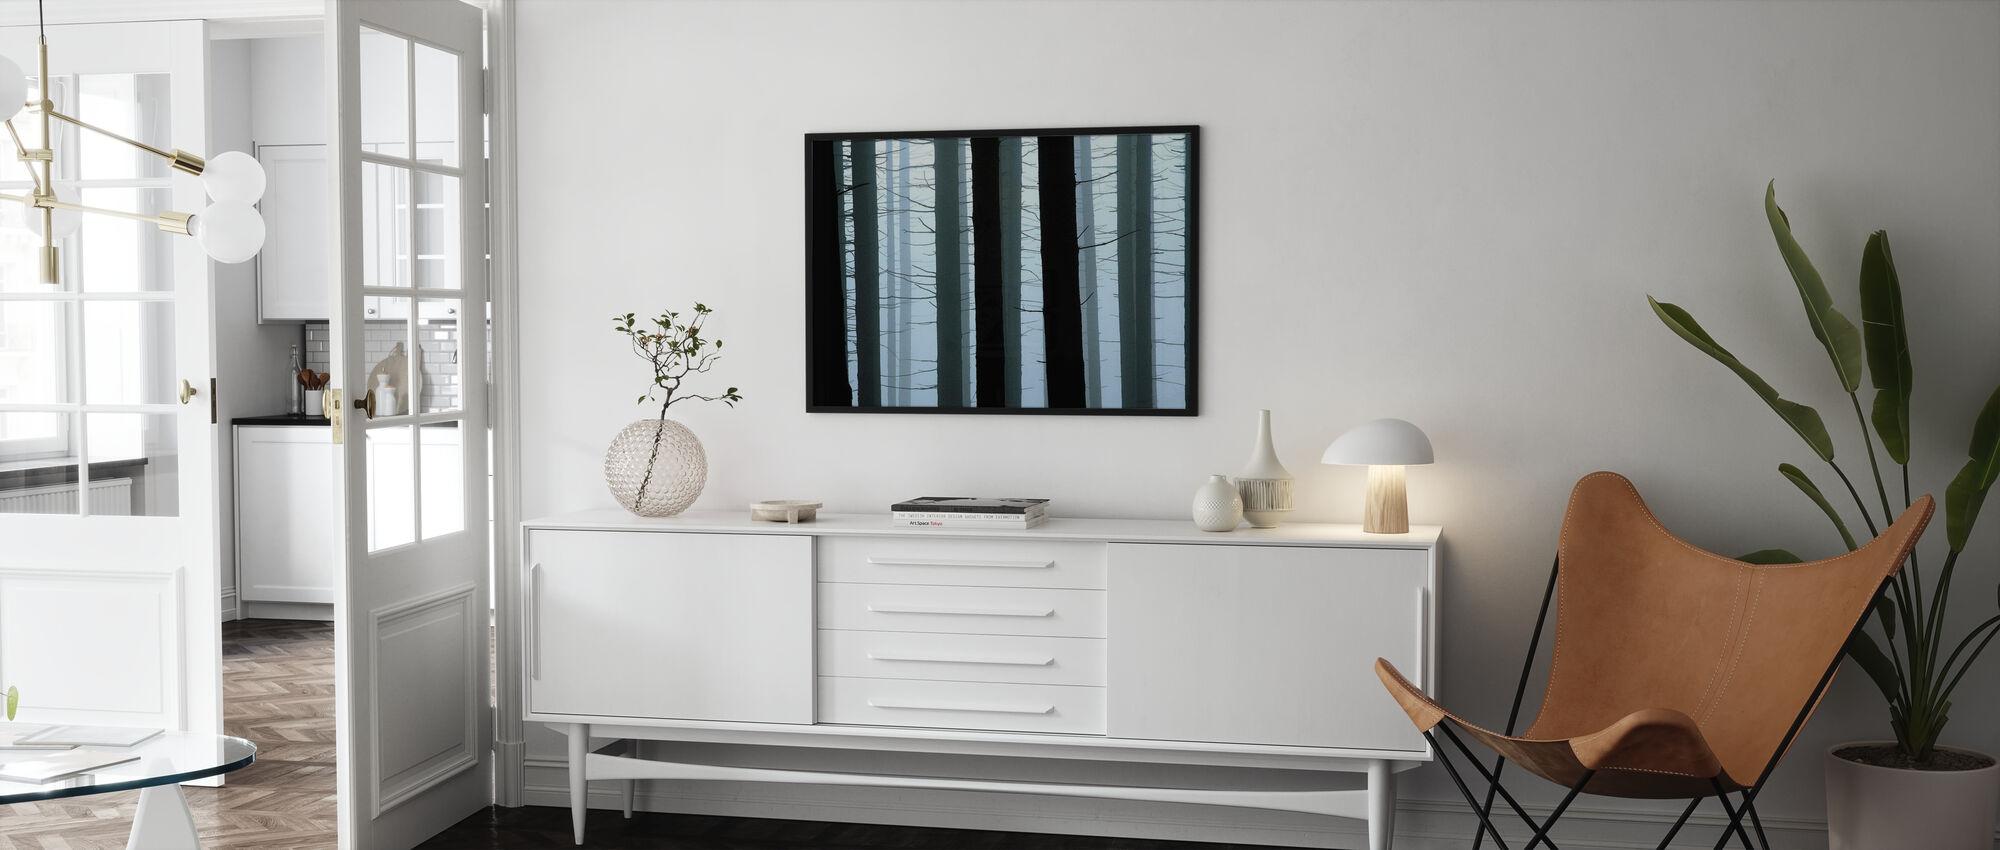 Twilight Forest - Poster - Living Room